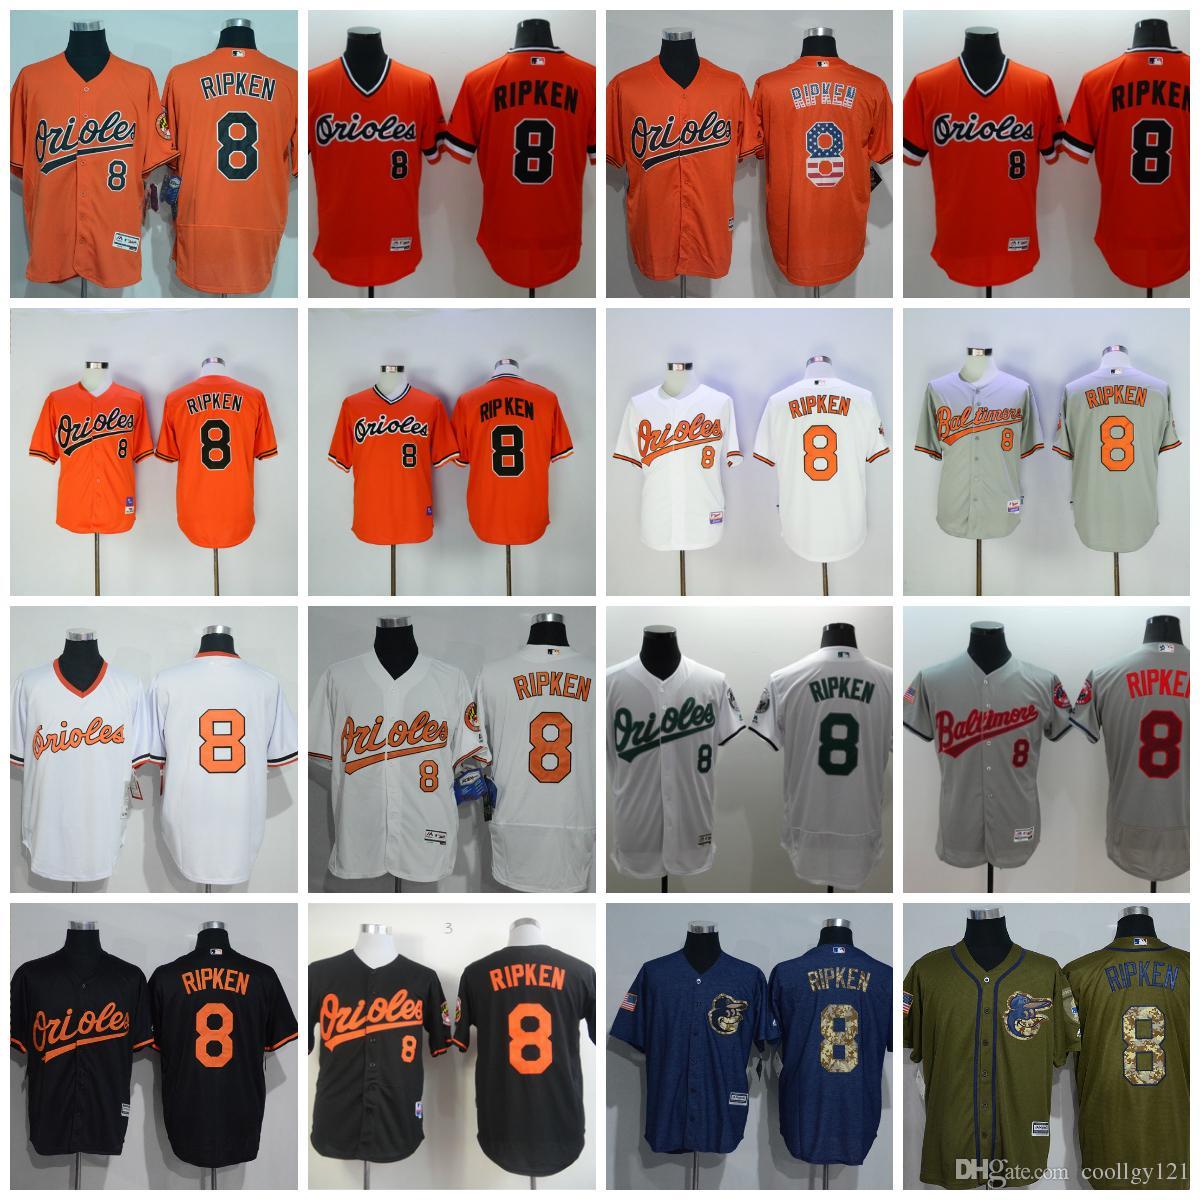 cd2dcc191 ... 2017 Cheap MenS 8 Cal Ripken Jersey 1989 Cooperstown Baltimore Orioles  Baseball Jerseys Throwback Cream Flexbase Mens Black Cal Ripken ...